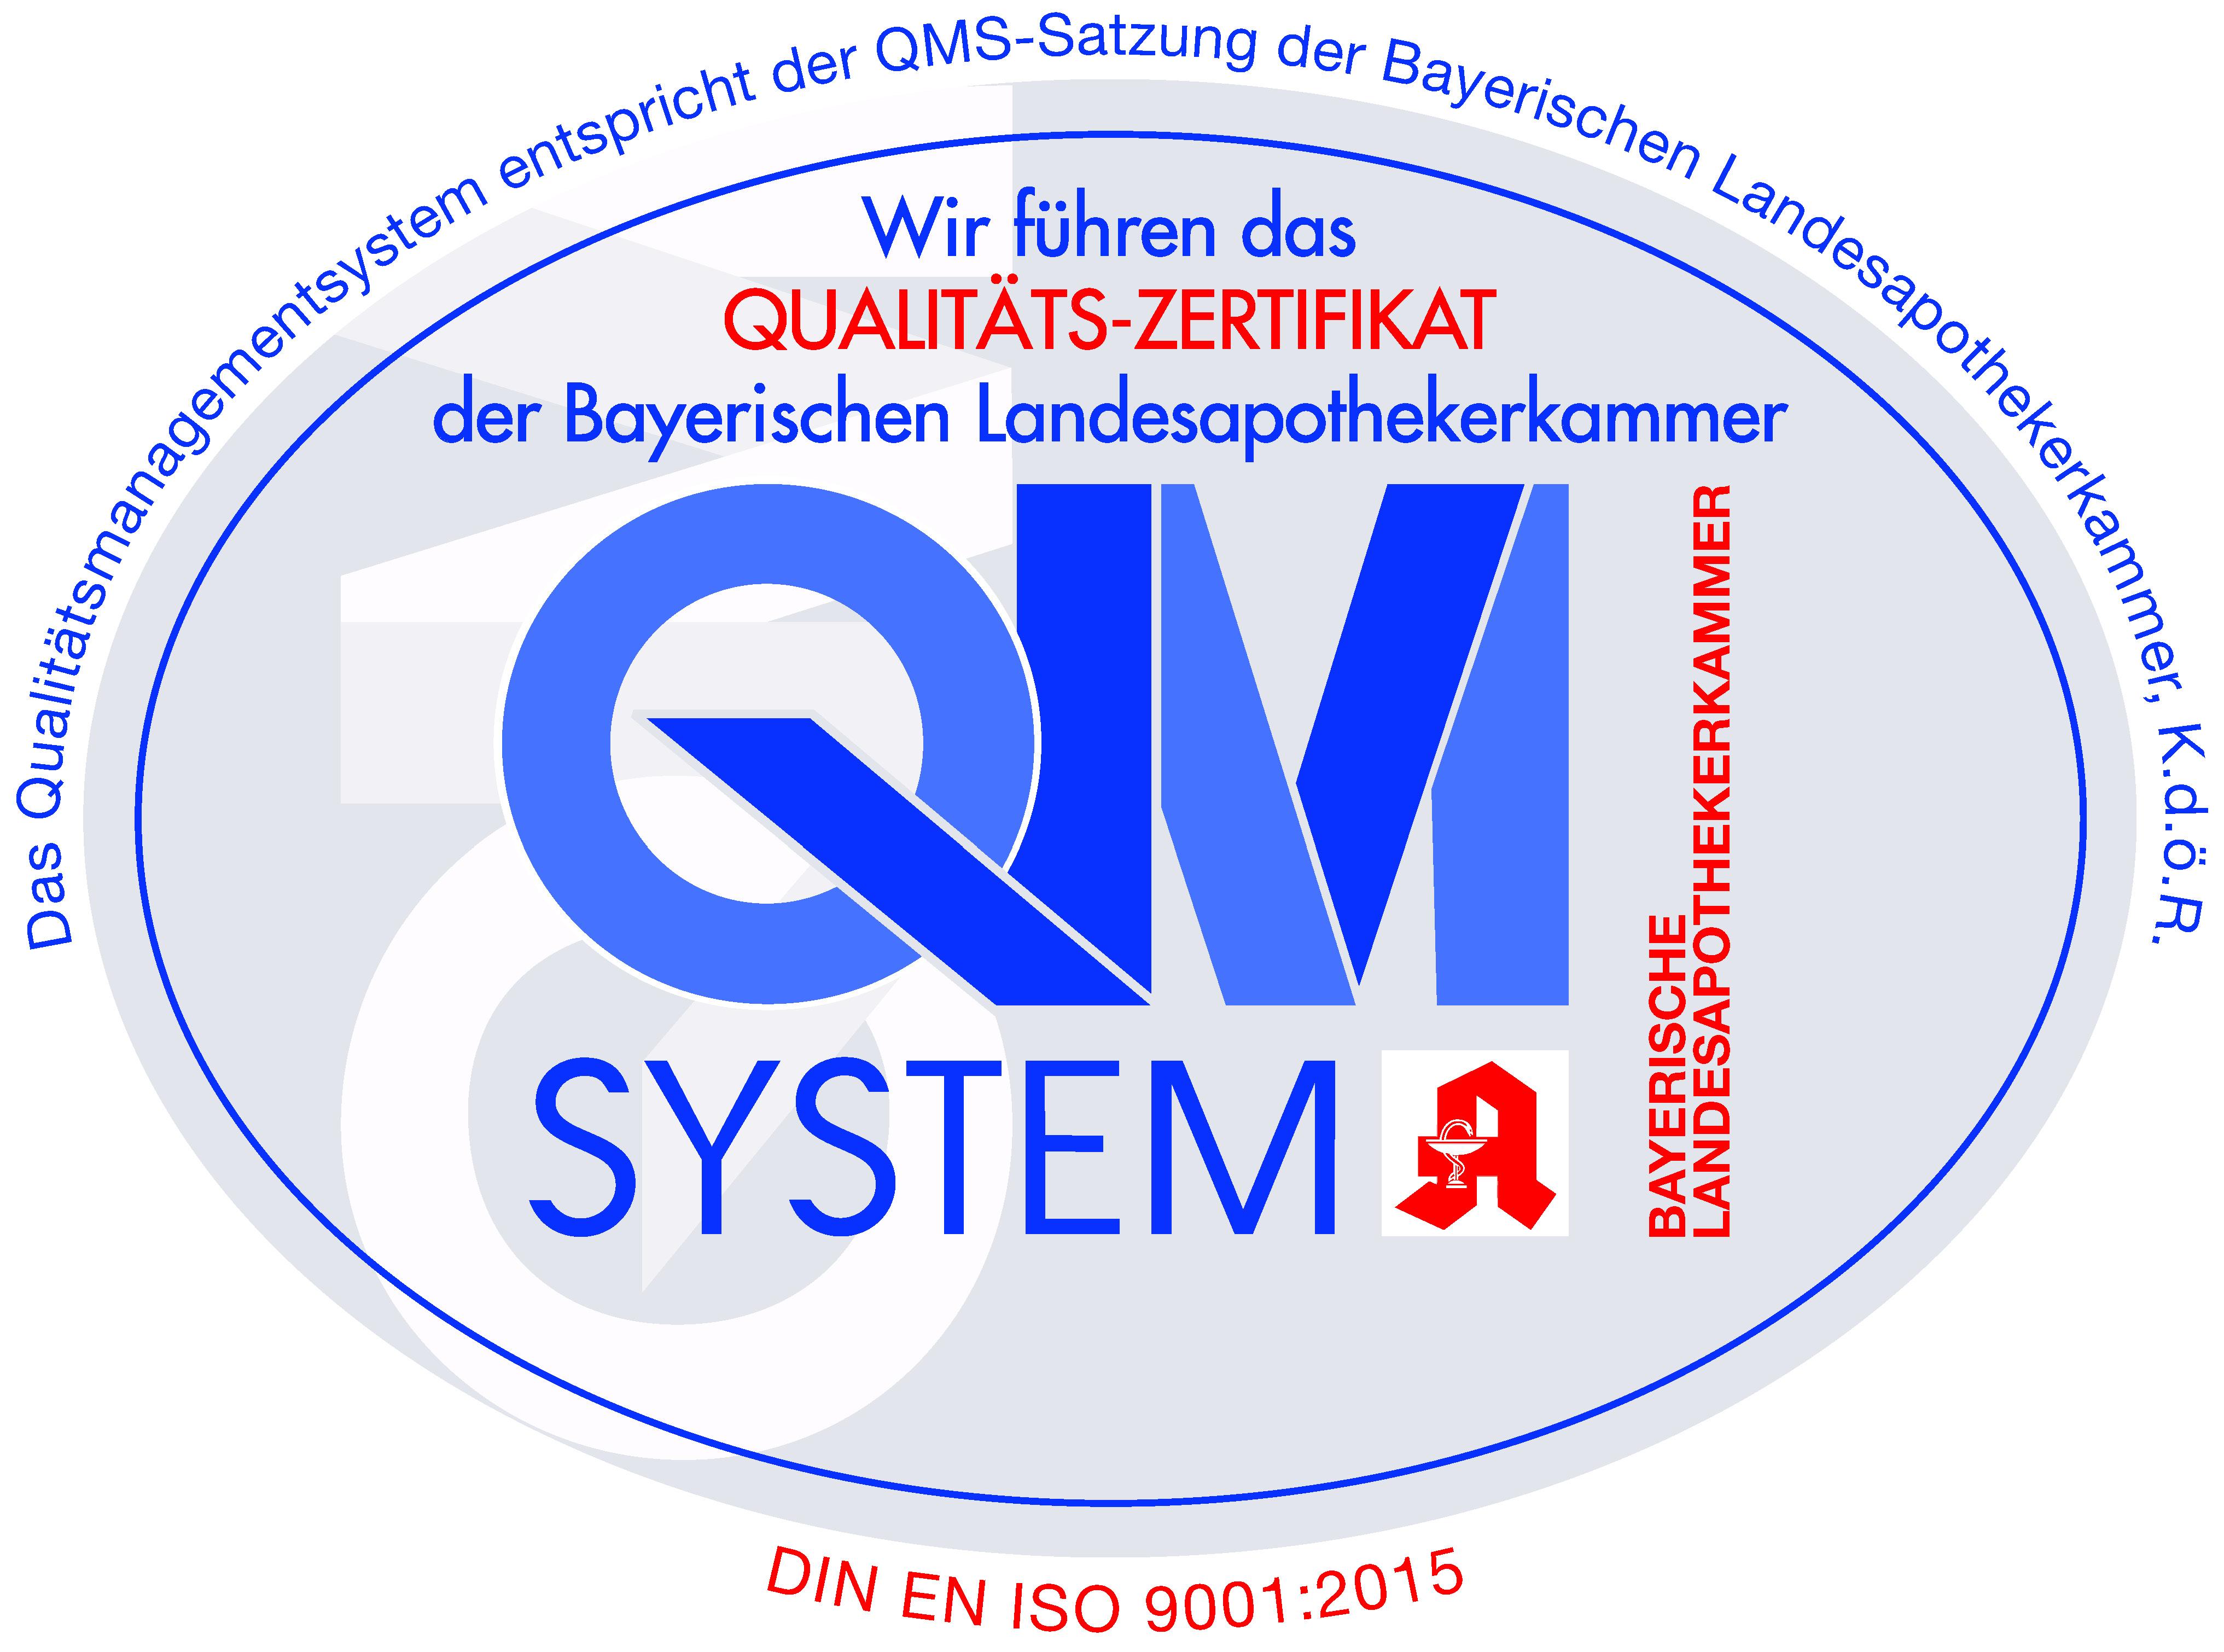 bayern_qms_oval2015-2